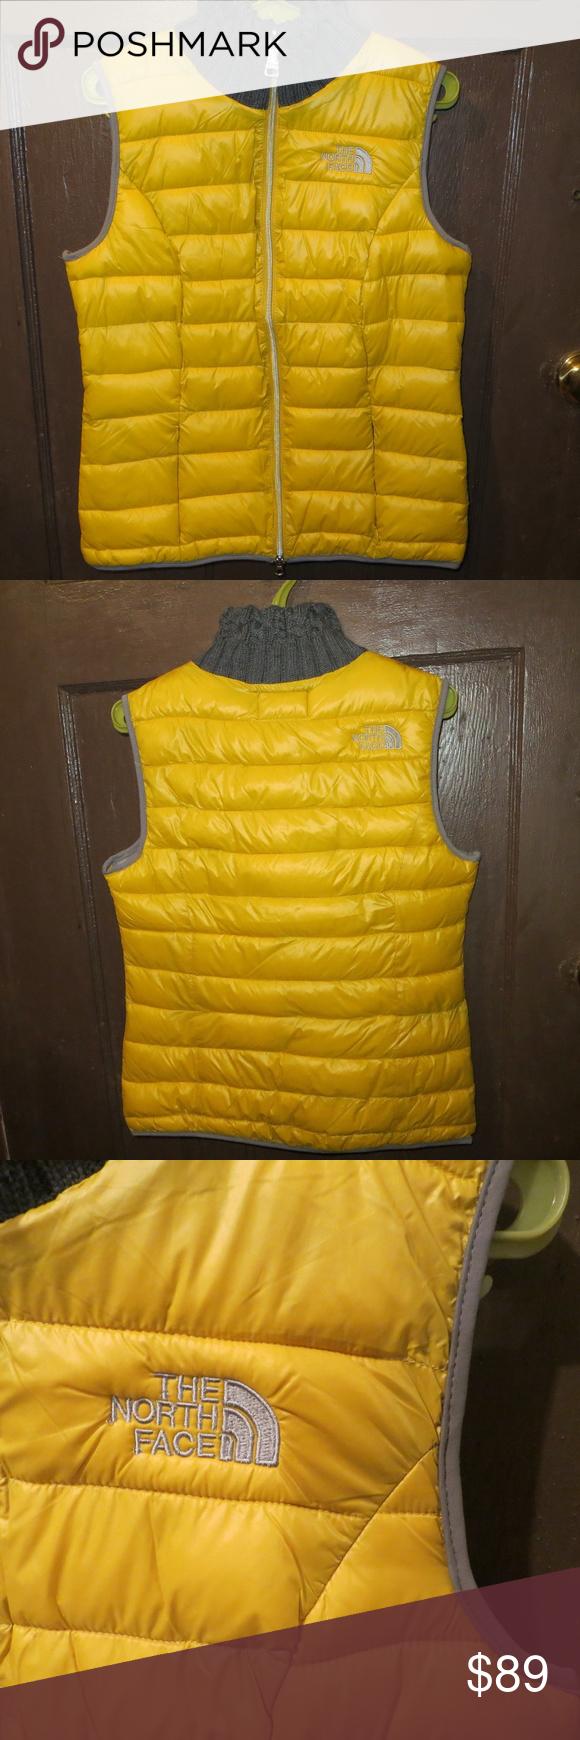 Northface Puffy Vest Nwt Clothes Design Puffy Vest North Face Vest [ 1740 x 580 Pixel ]